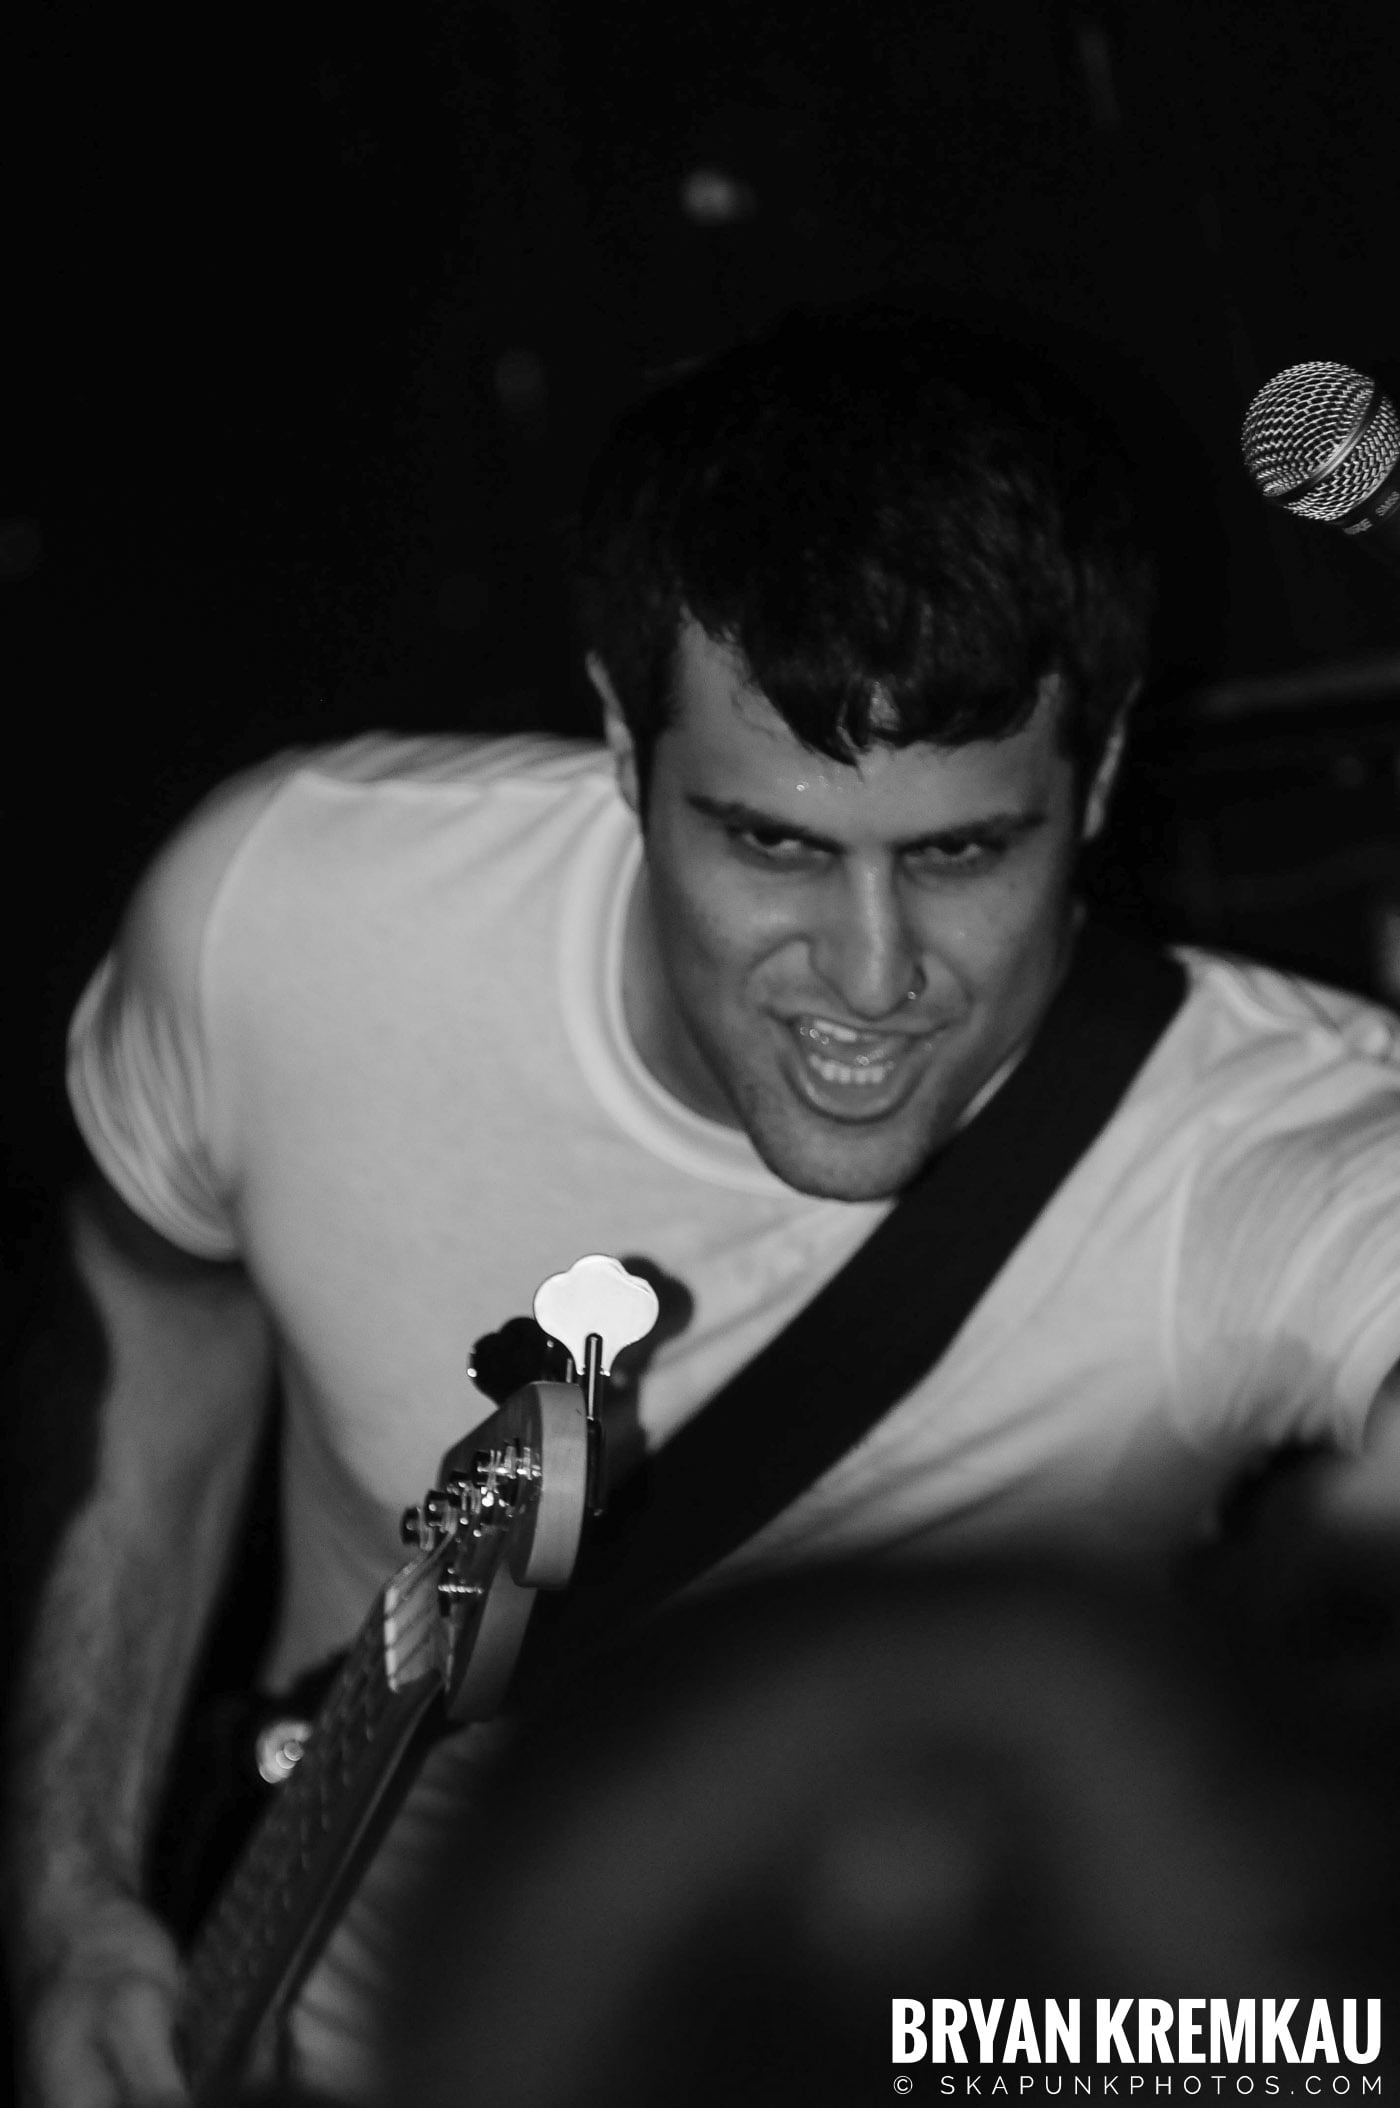 Gaslight Anthem @ Cafe Metropolis, Wilkes-Barre PA - 9.18.08 (4)